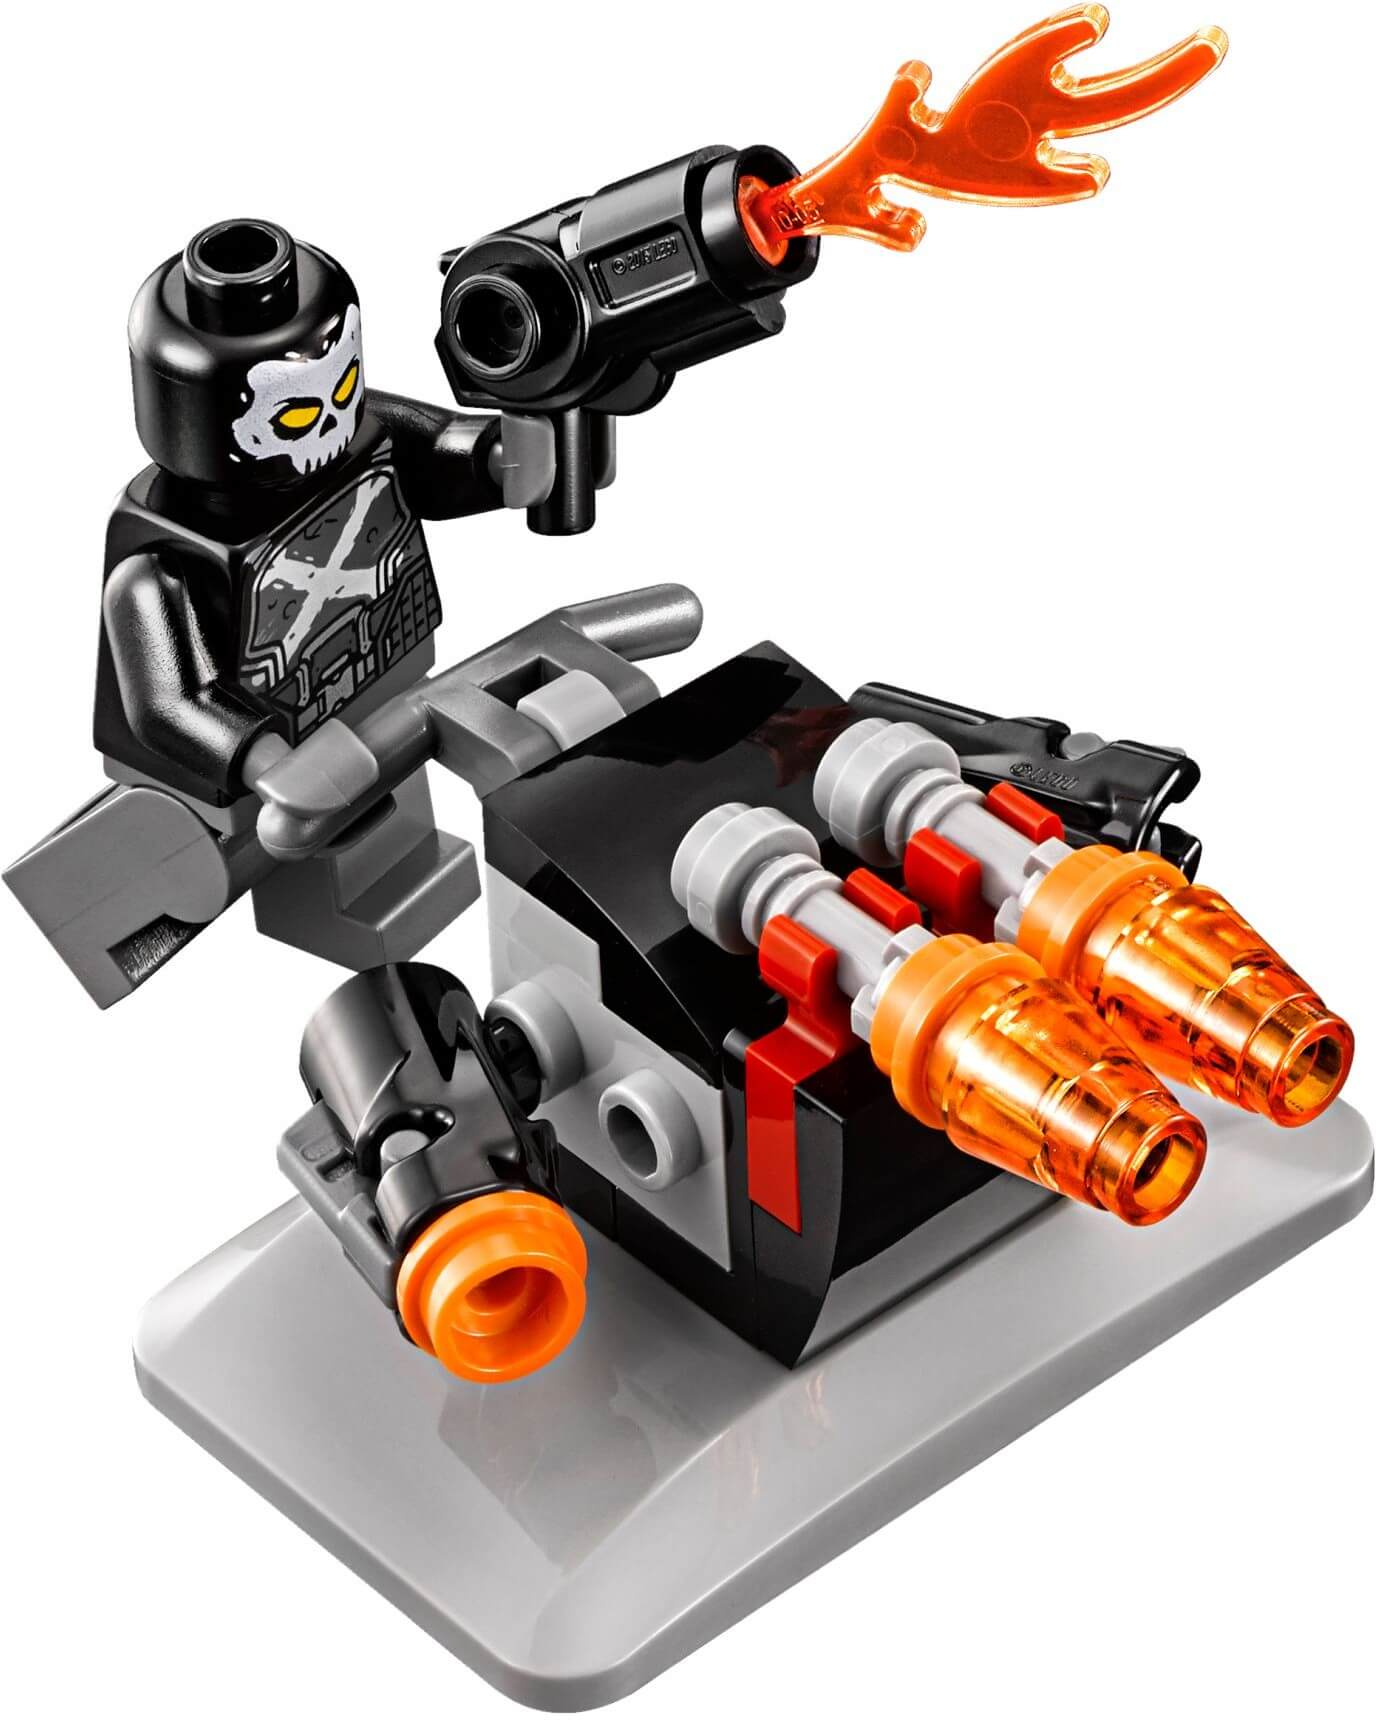 Mua đồ chơi LEGO 76050 - LEGO Marvel Super Heroes 76050 - Black Widow mai phục Crossbones (LEGO Marvel Super Heroes Crossbones' Hazard Heist 76050)